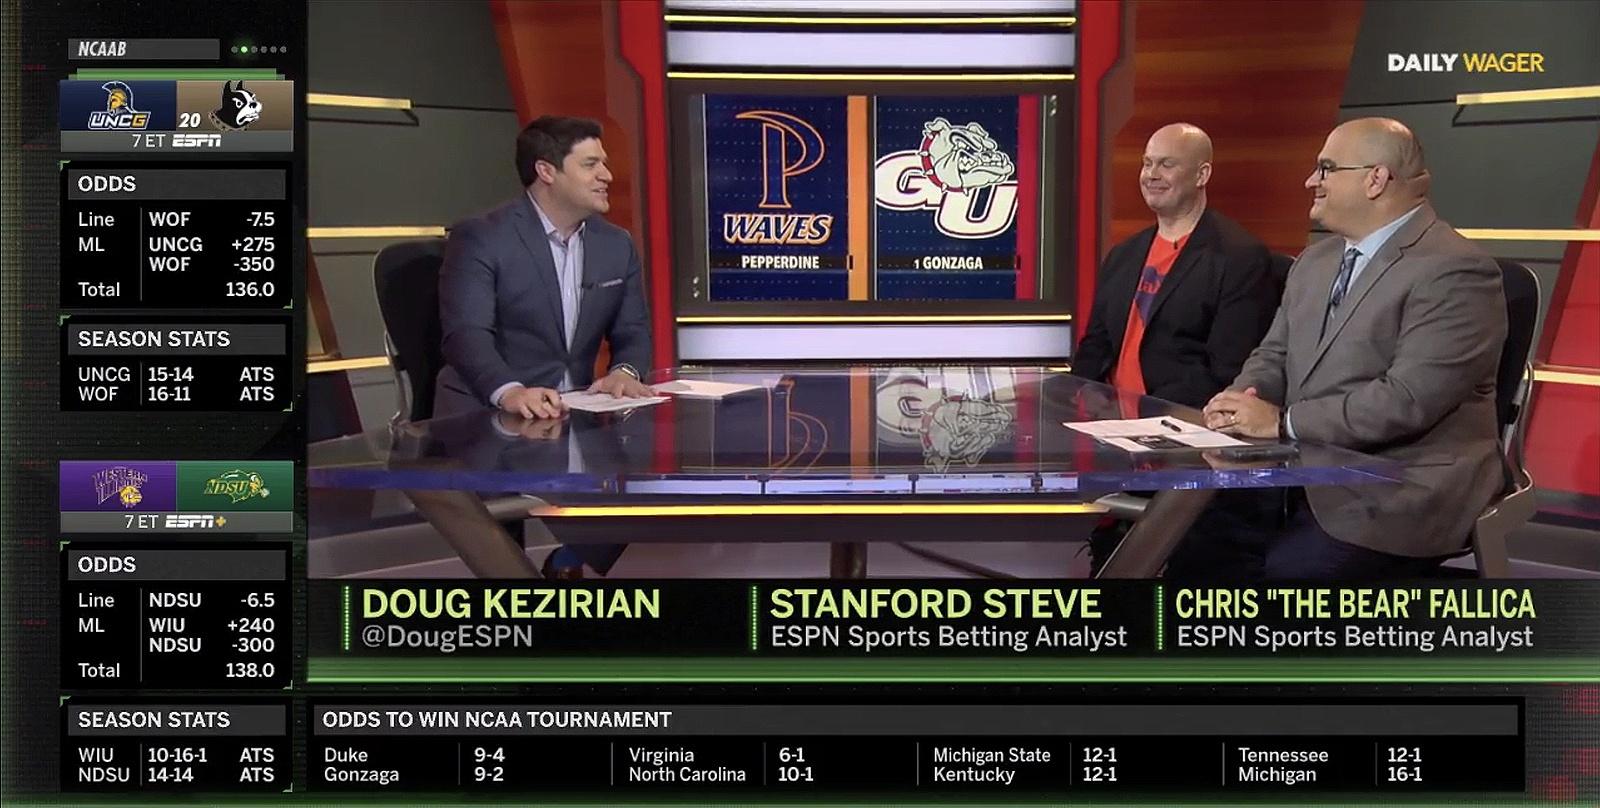 ESPN Caesars sports betting